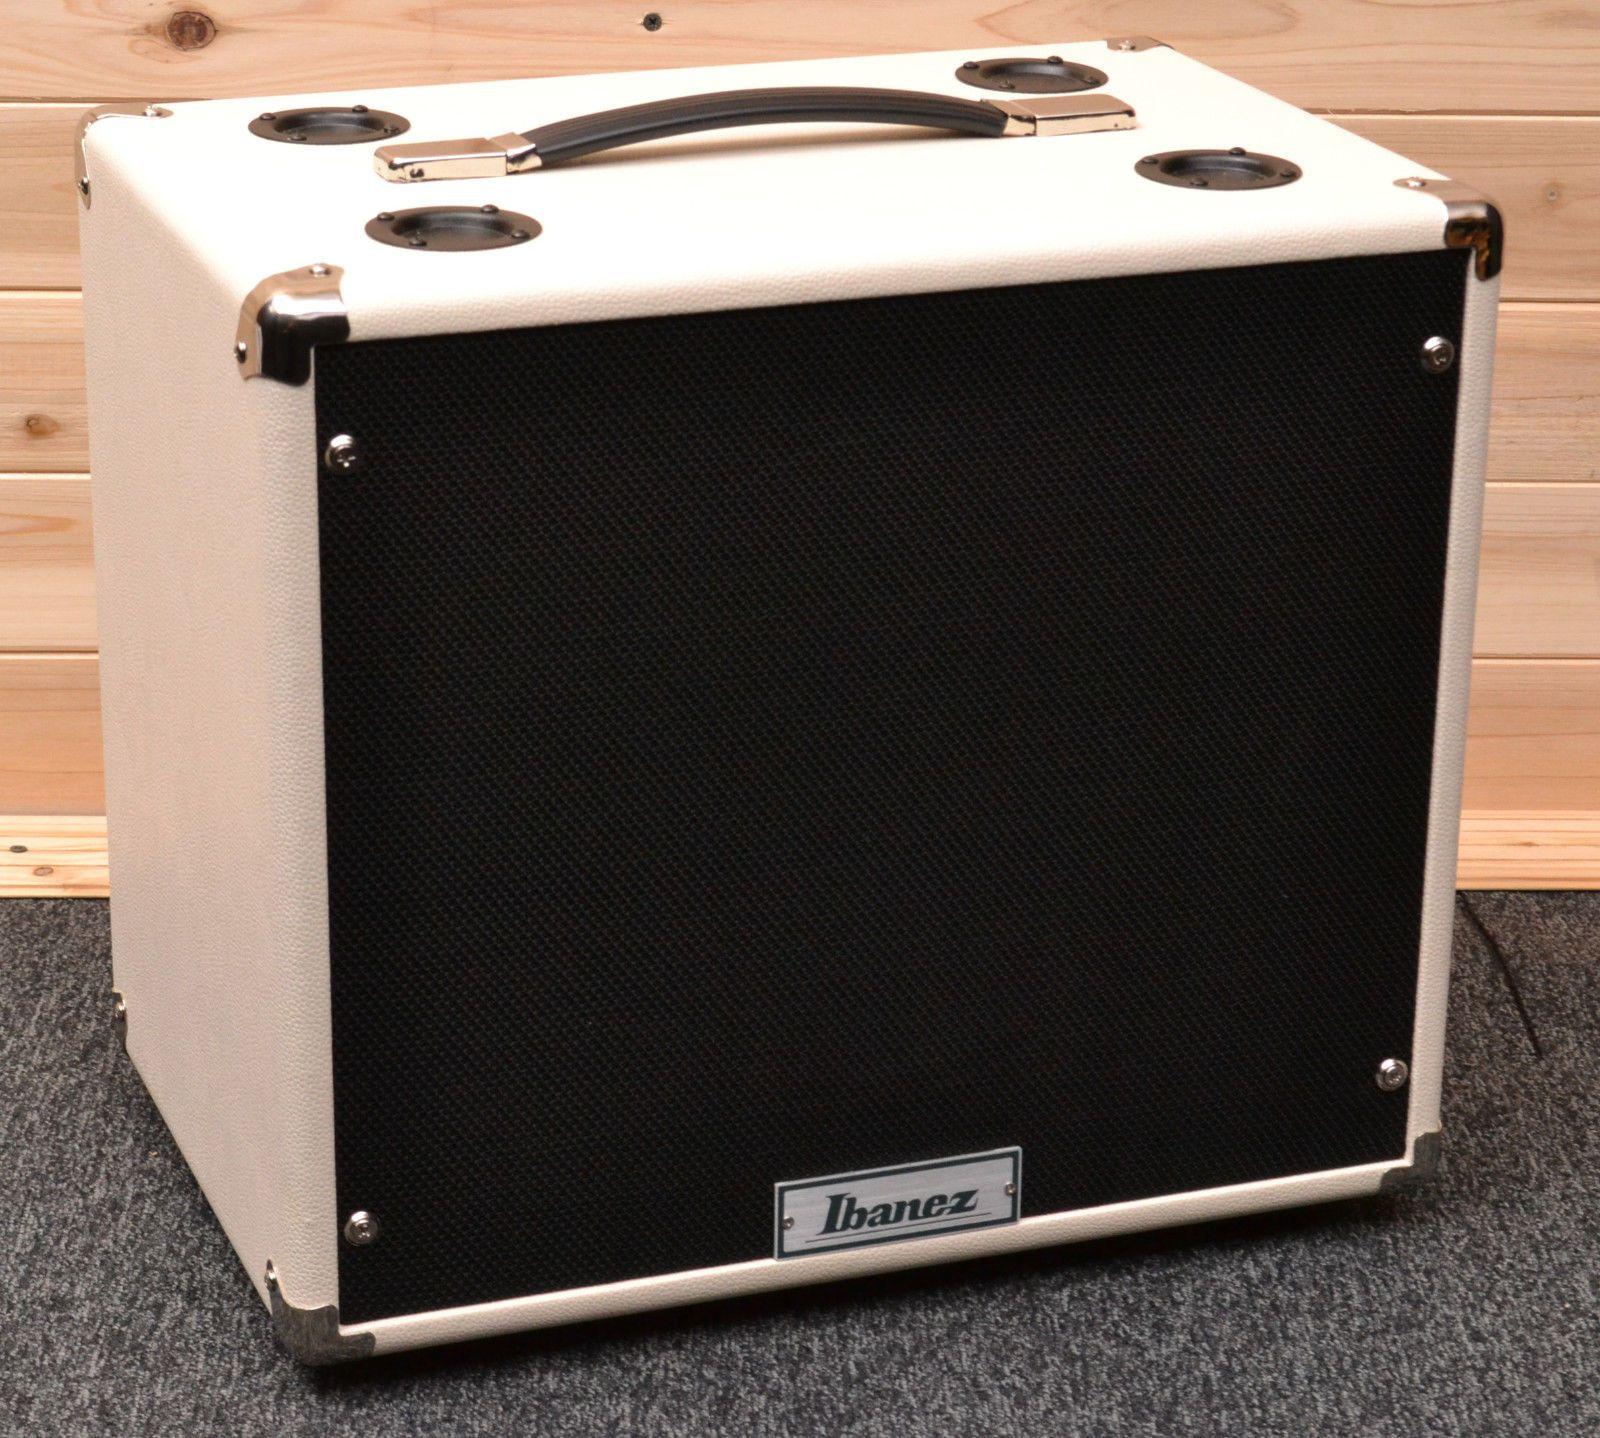 Ibanez Tsa112c Tube Screamer 80w 1x12 Guitar Amp Cabinet White Guitar Amp Diy Cabinets Guitar